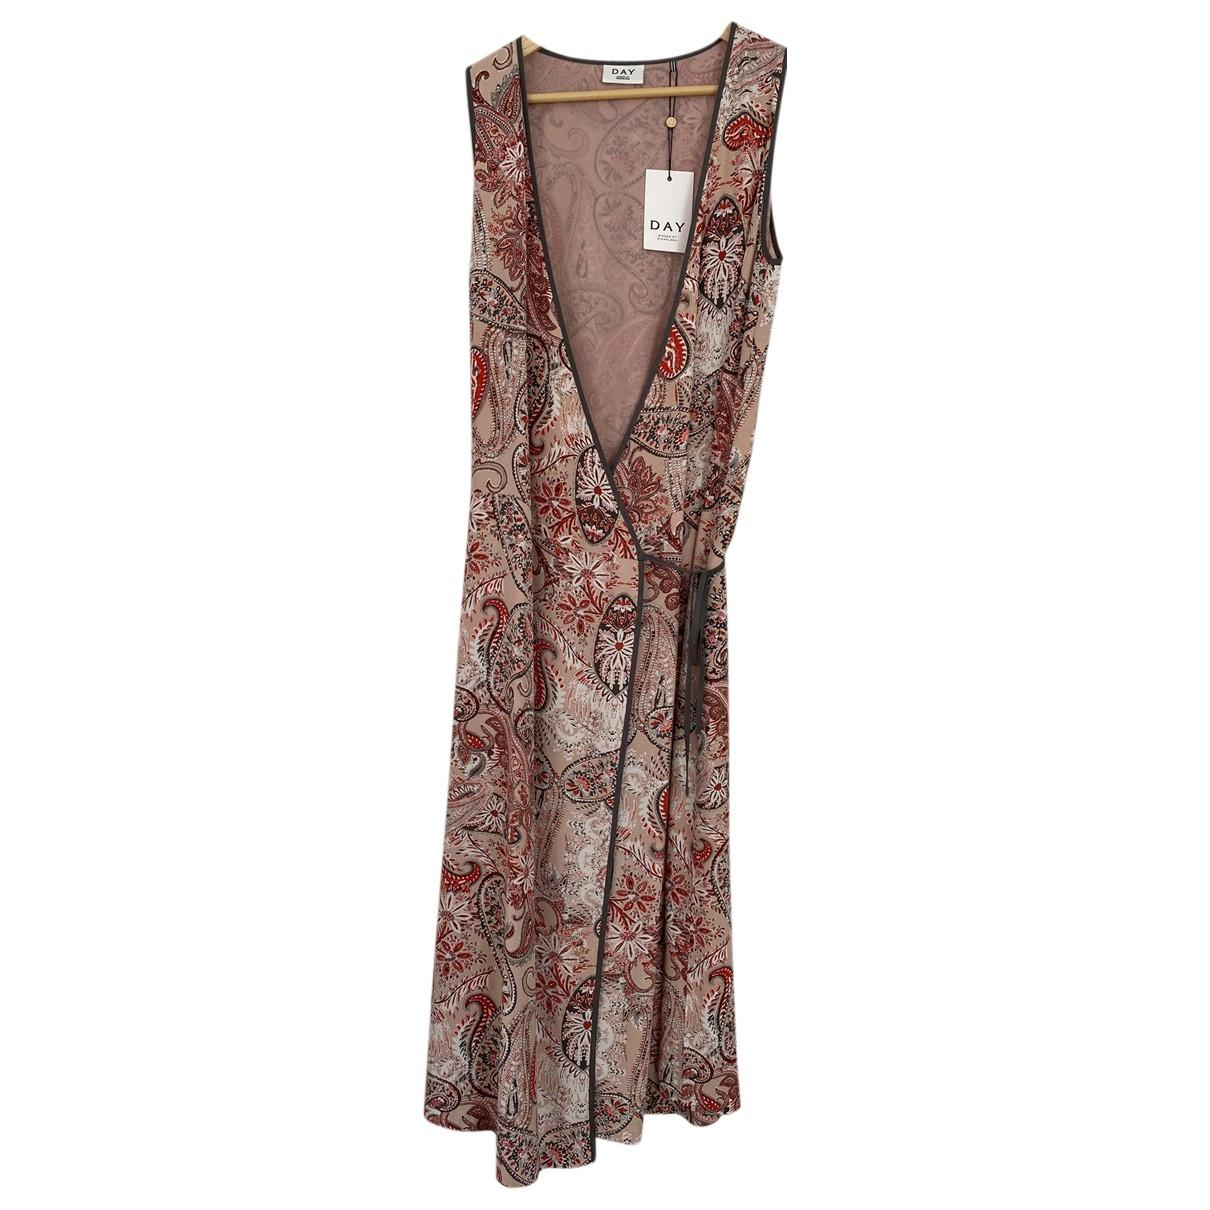 Day Birger & Mikkelsen \N Pink dress for Women 36 FR